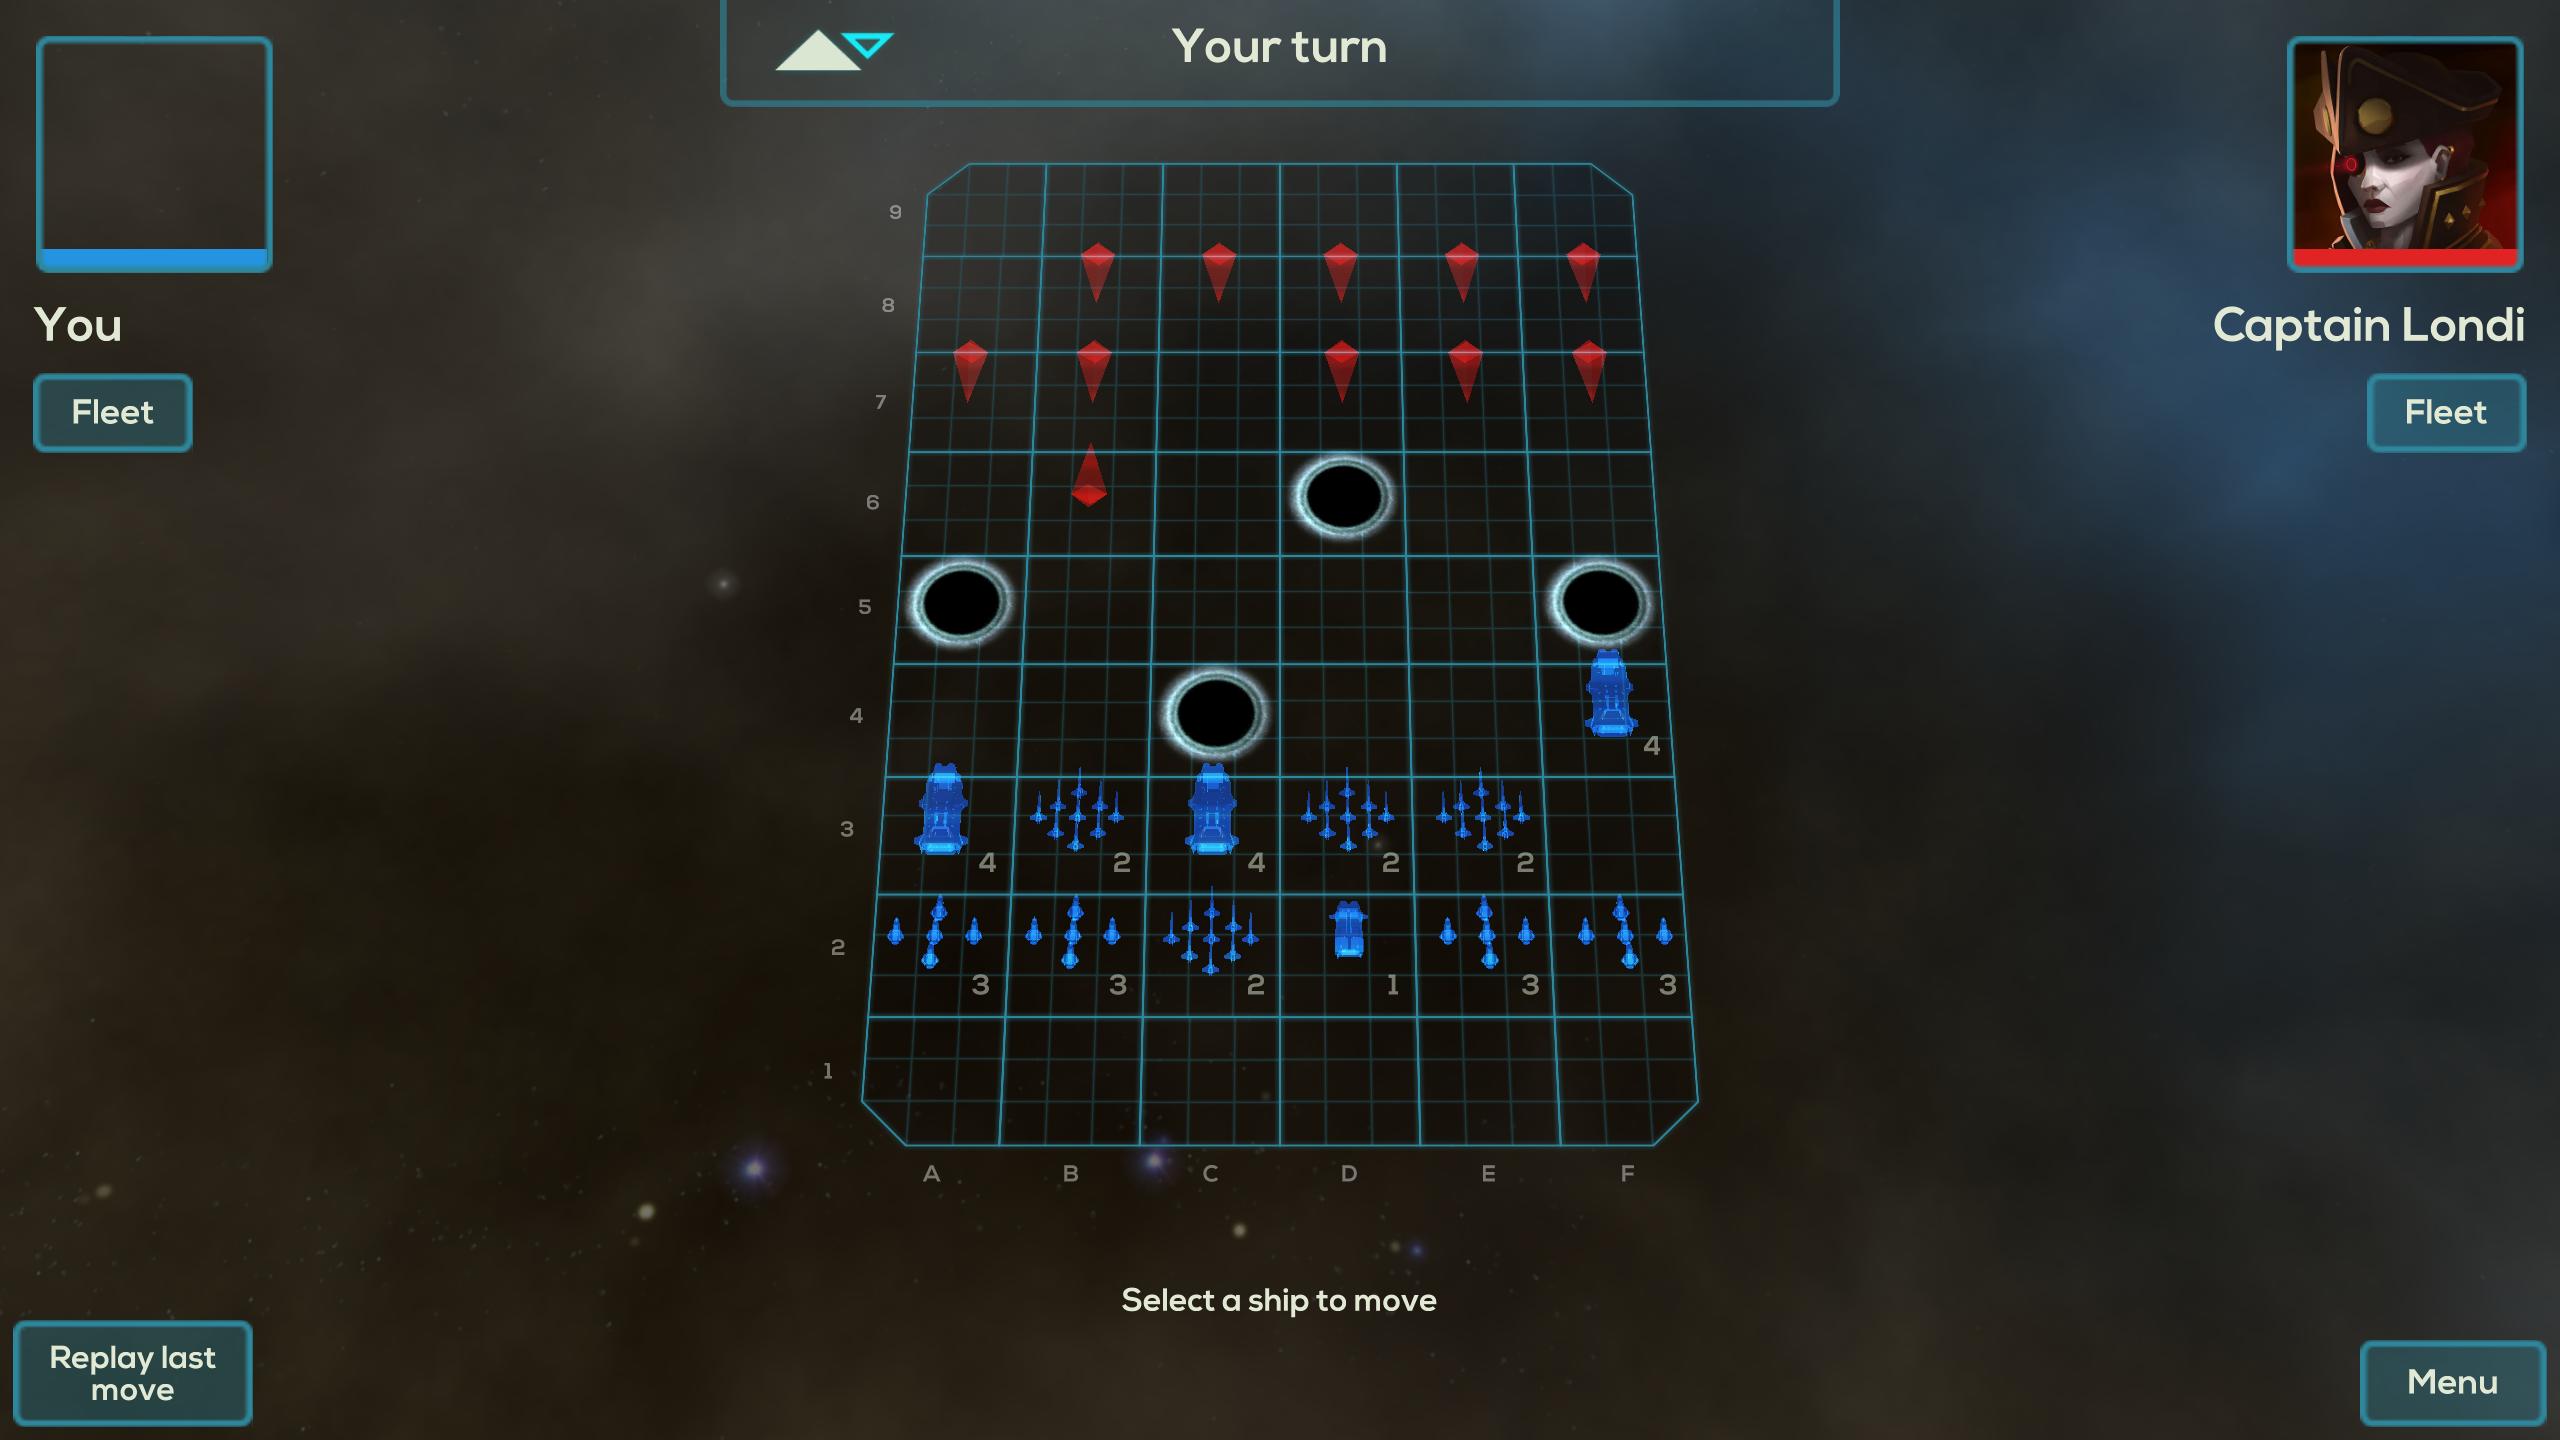 It took me many tries to wrap my head around how to maneuver through this tutorial scenario.